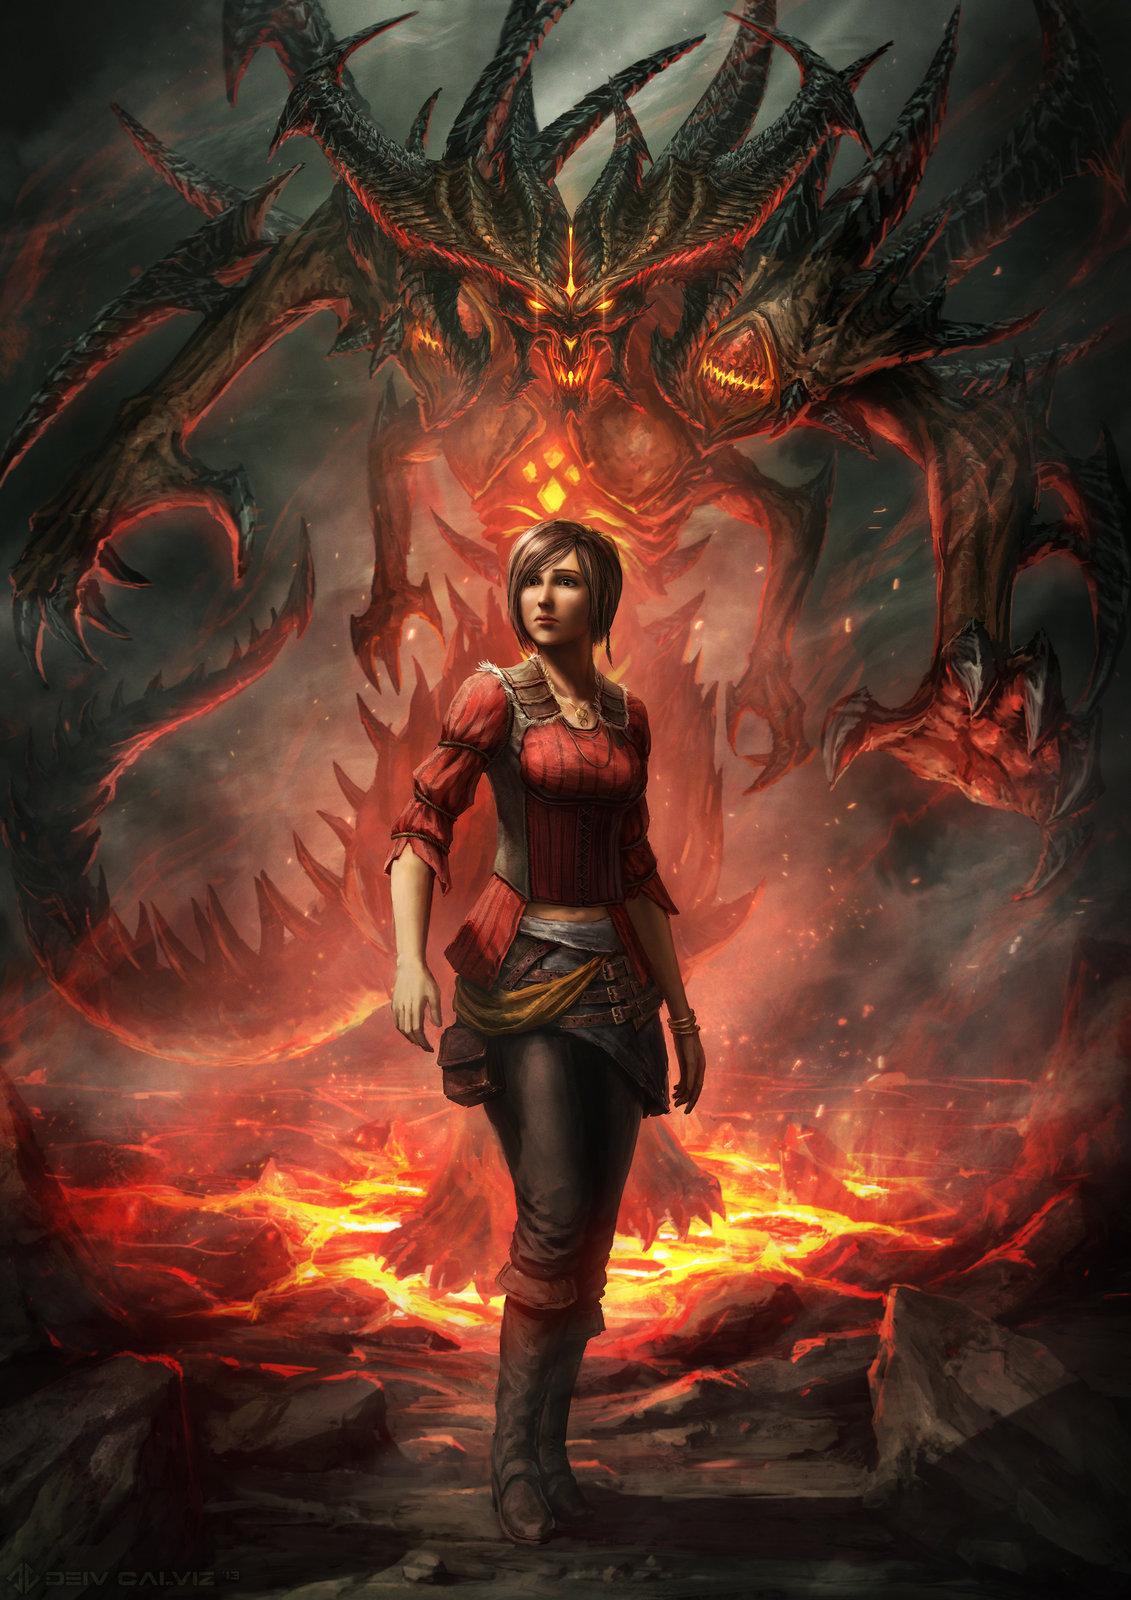 Diablo 3 - Anniversary